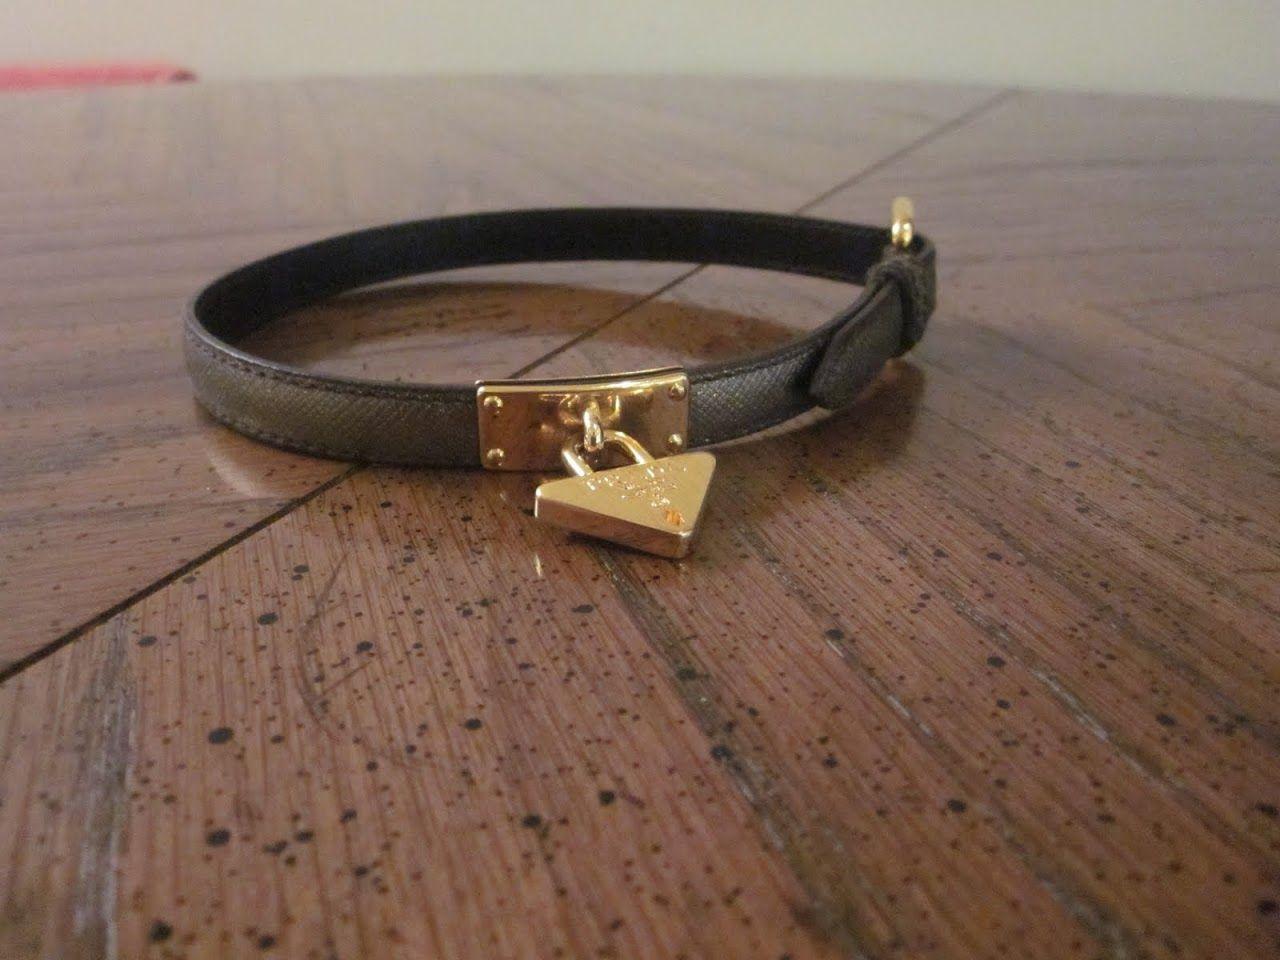 bf1ca2fea5047 Prada Dog Collar | Cool stuff | Dogs, Collars, Dog design